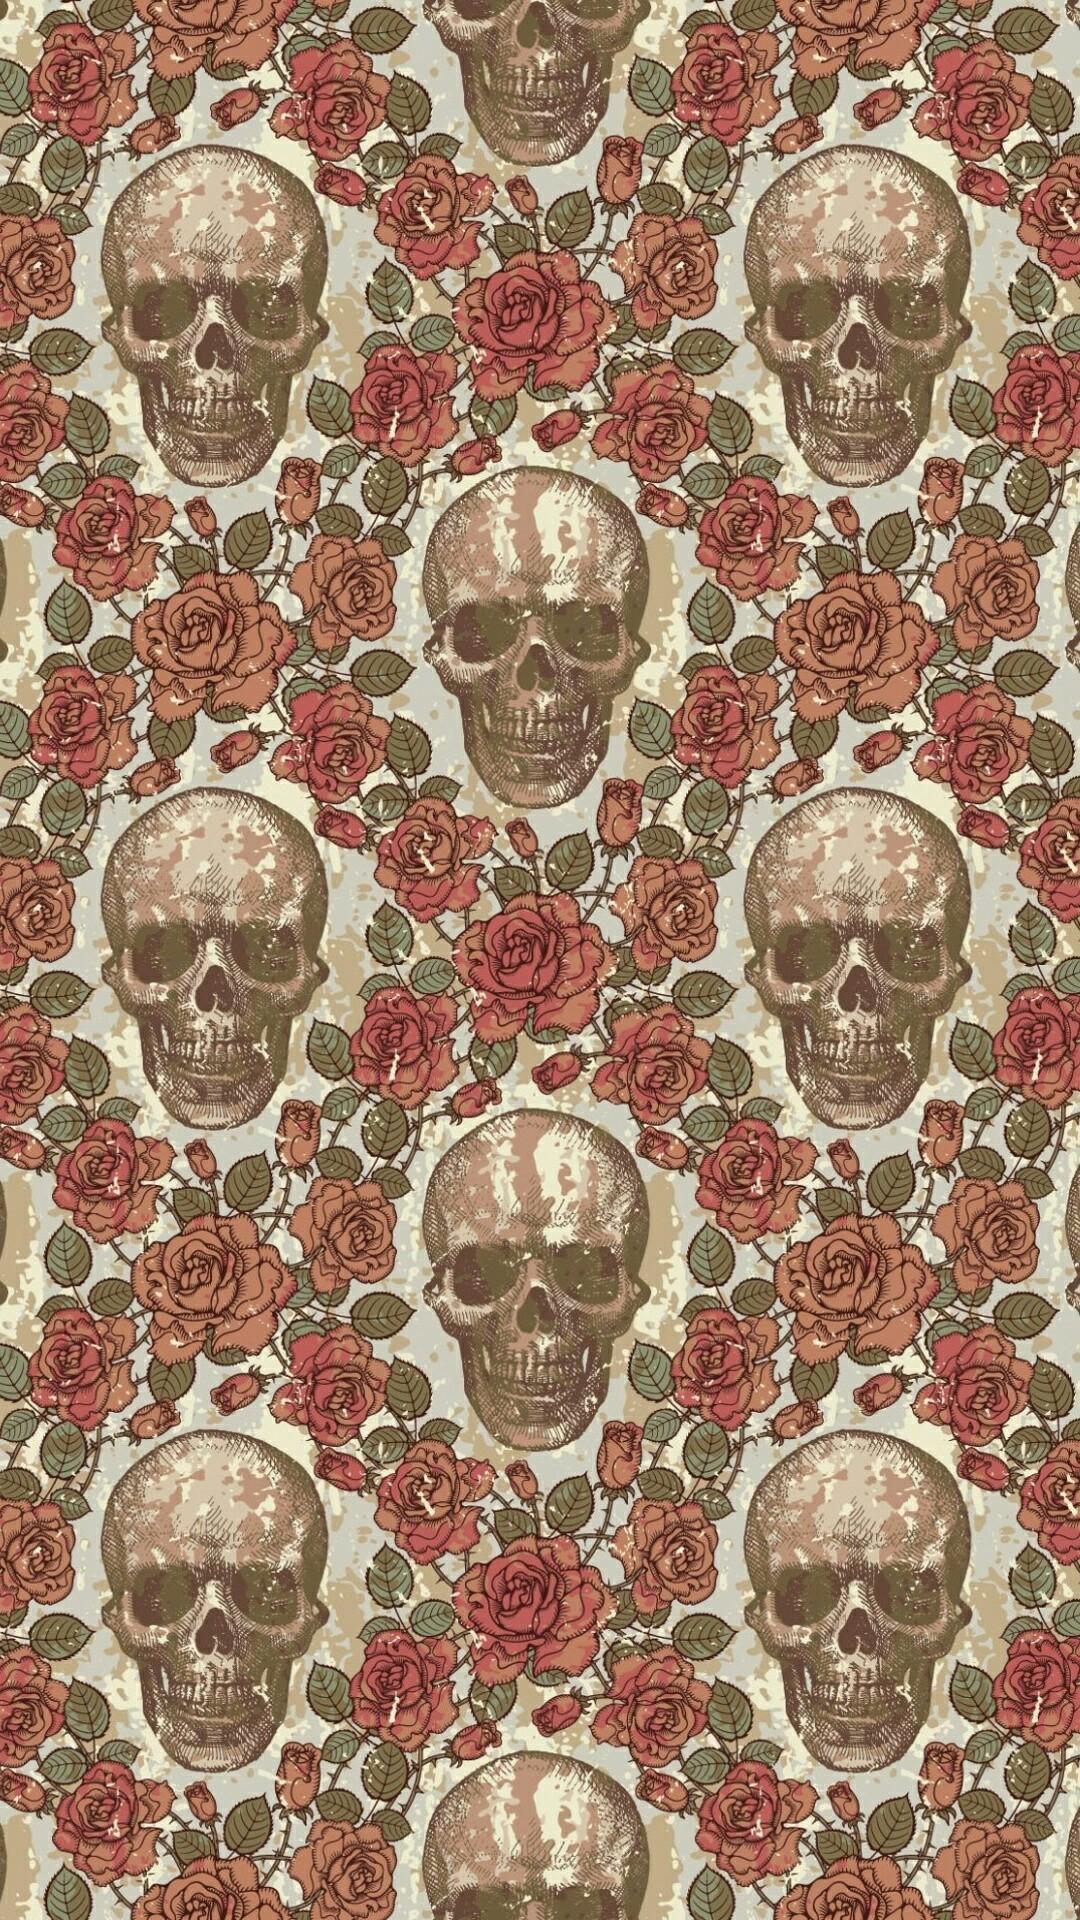 Sugar Skull Iphone Wallpaper Sugar Skull Wallpapers 60 Images